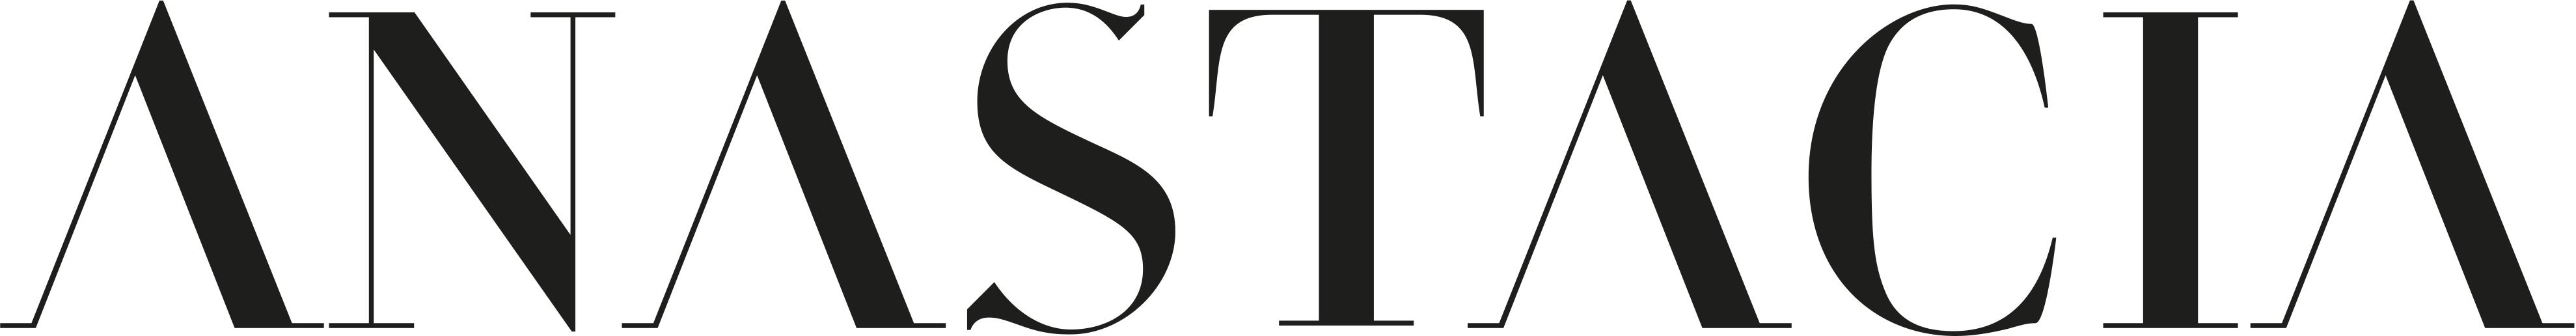 Anastacia logo